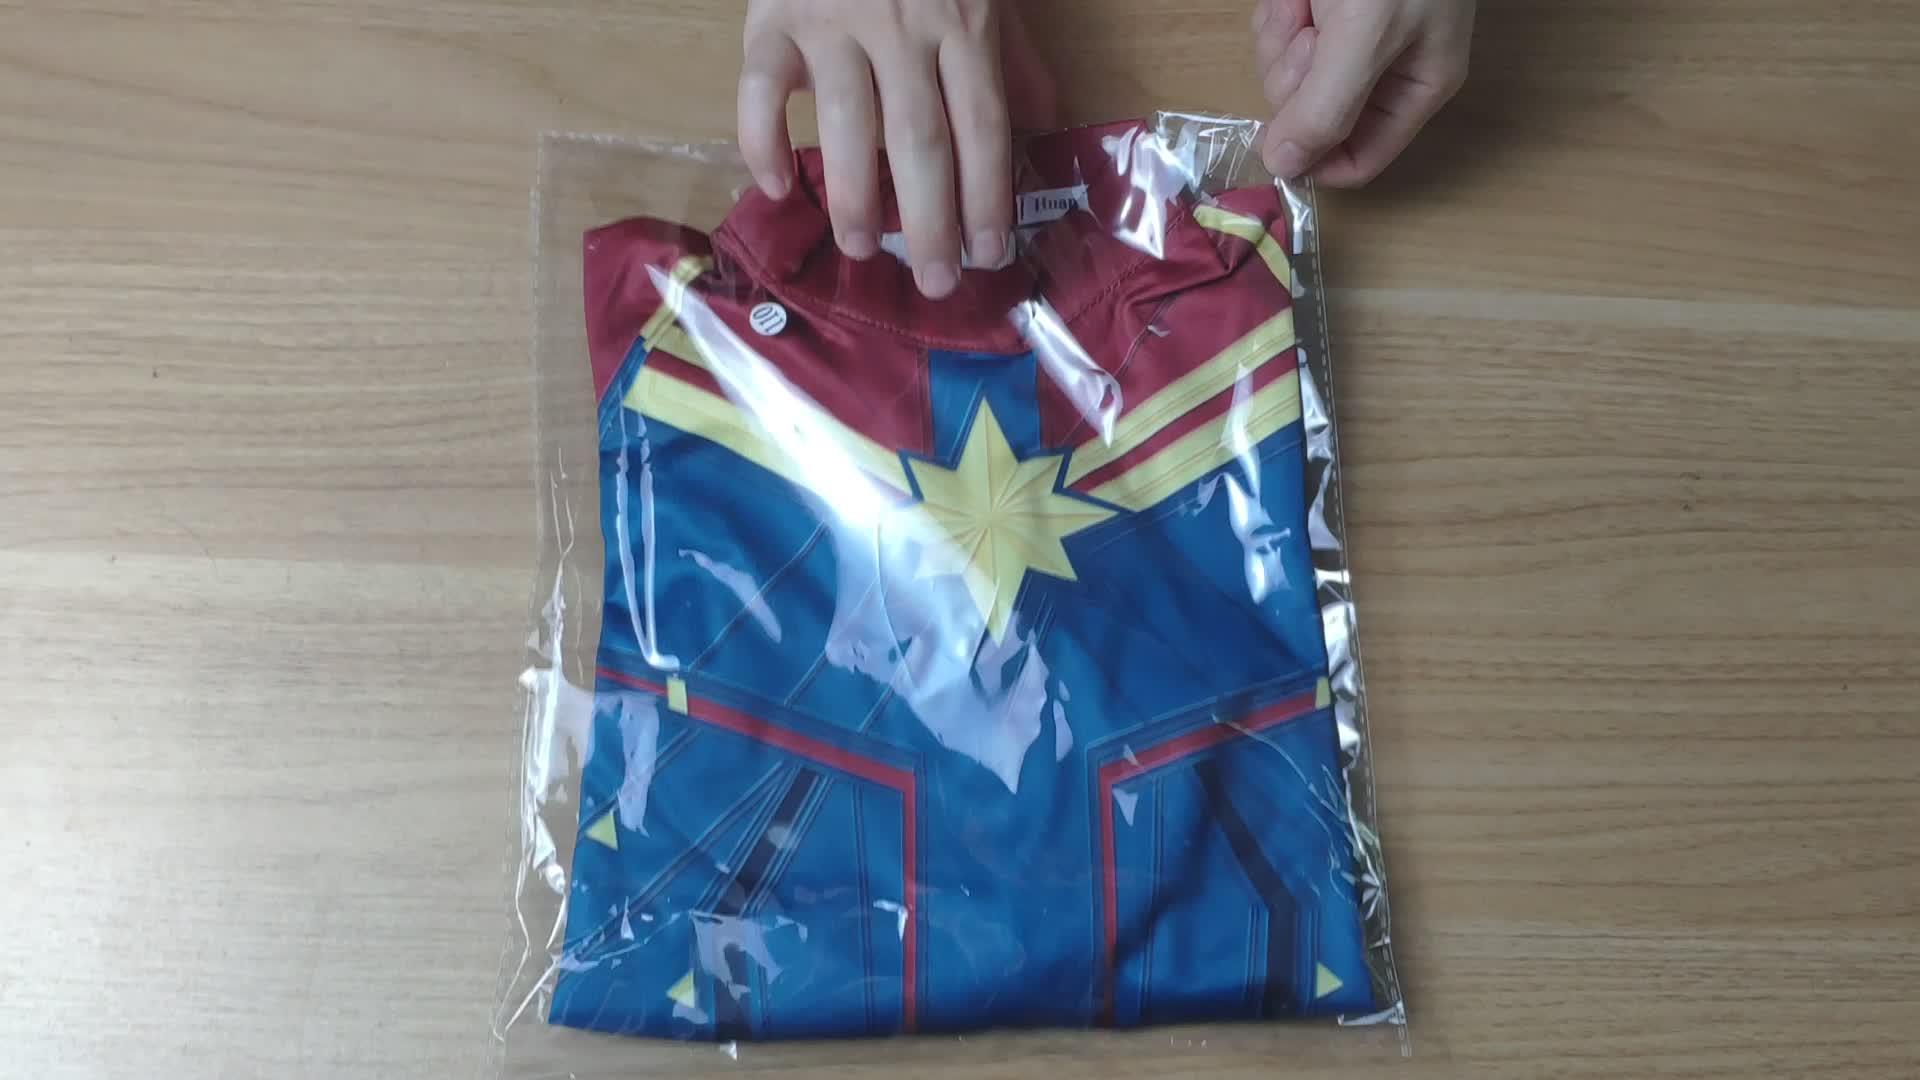 Endgame キャプテンマーベルコスチューム子供さん驚異キャロル Danvers ジャンプスーツ子供の量子ジャンプスーツ衣装女の子